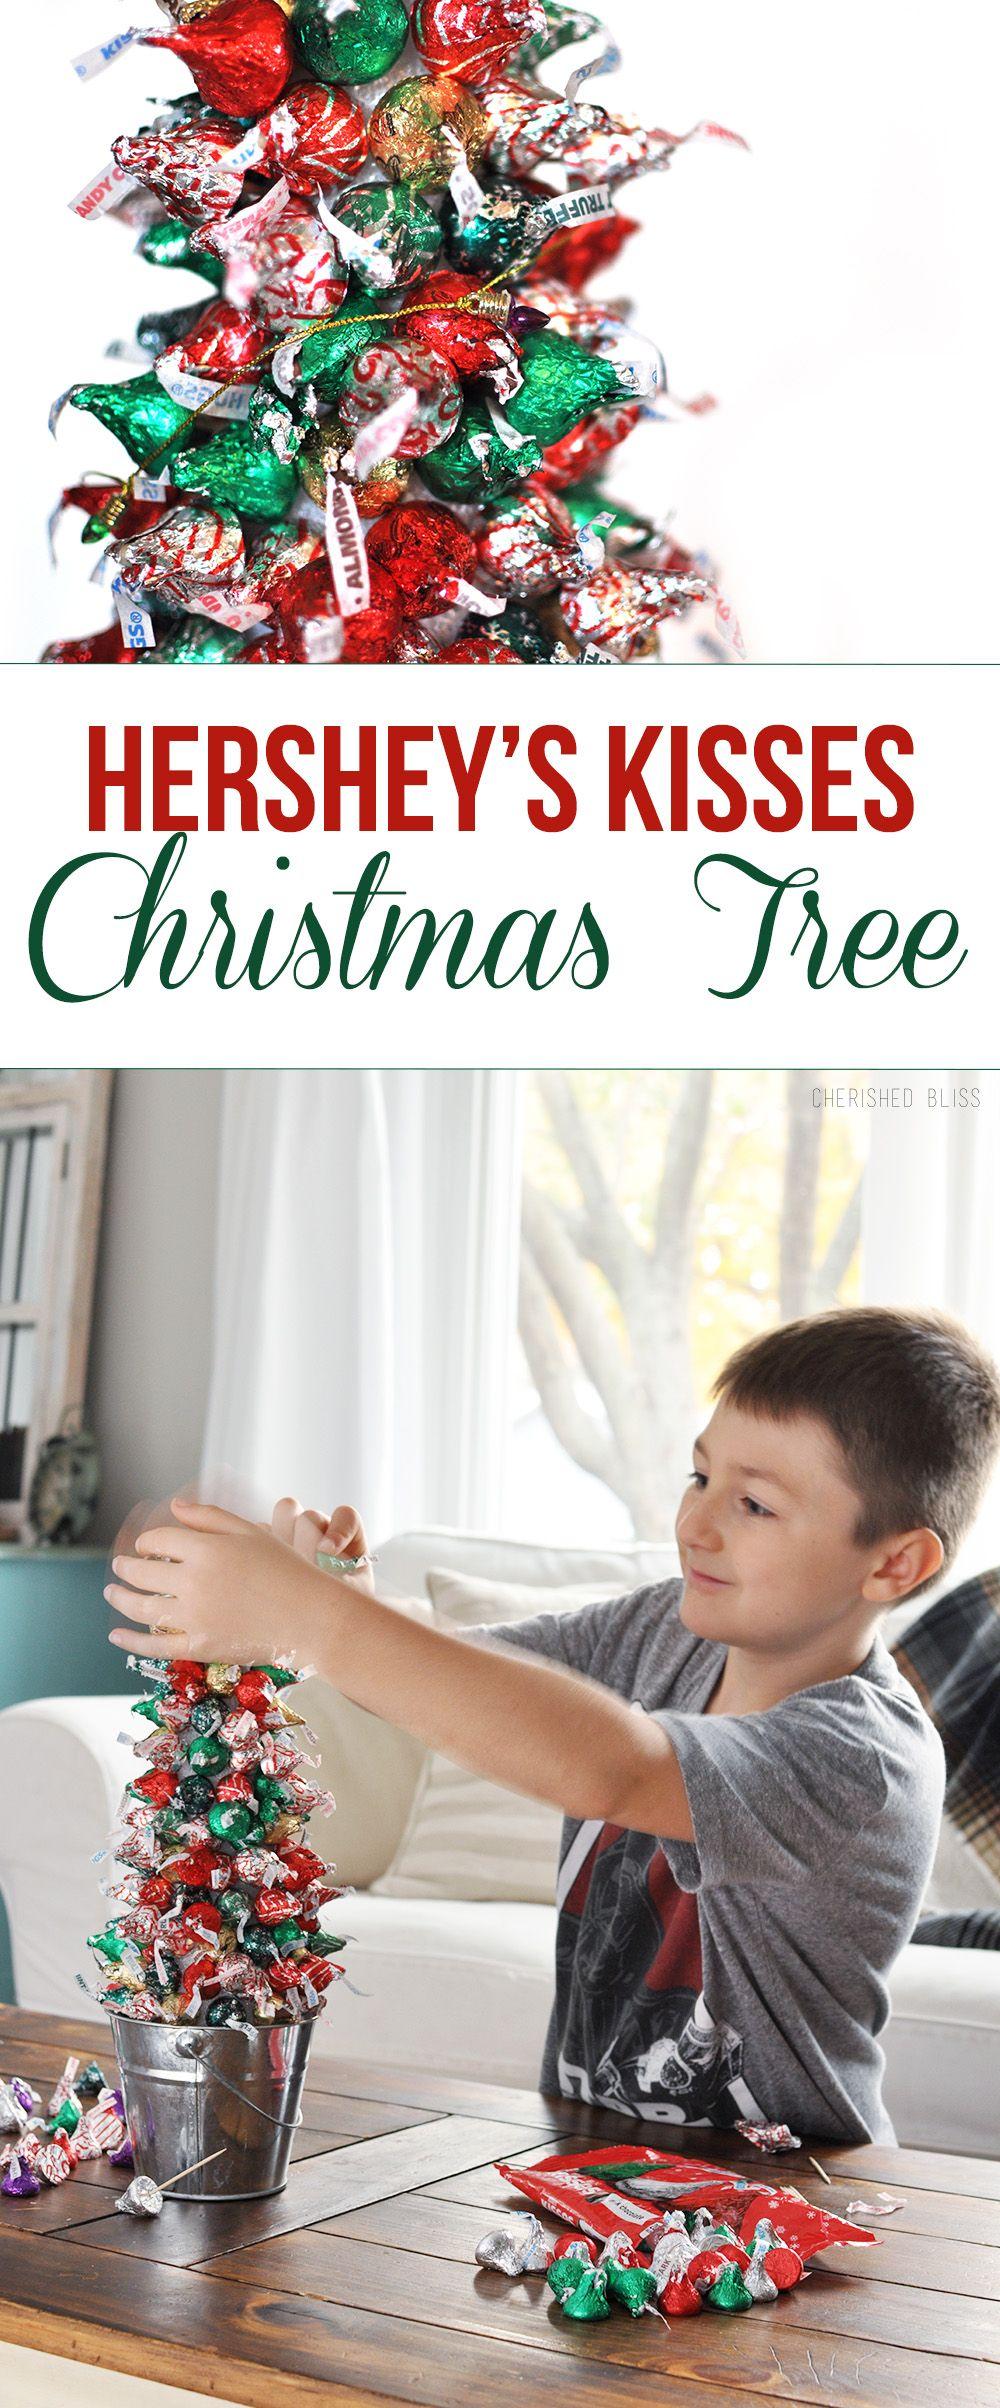 Hershey's Kisses Christmas Tree Tutorial | Diy christmas ...